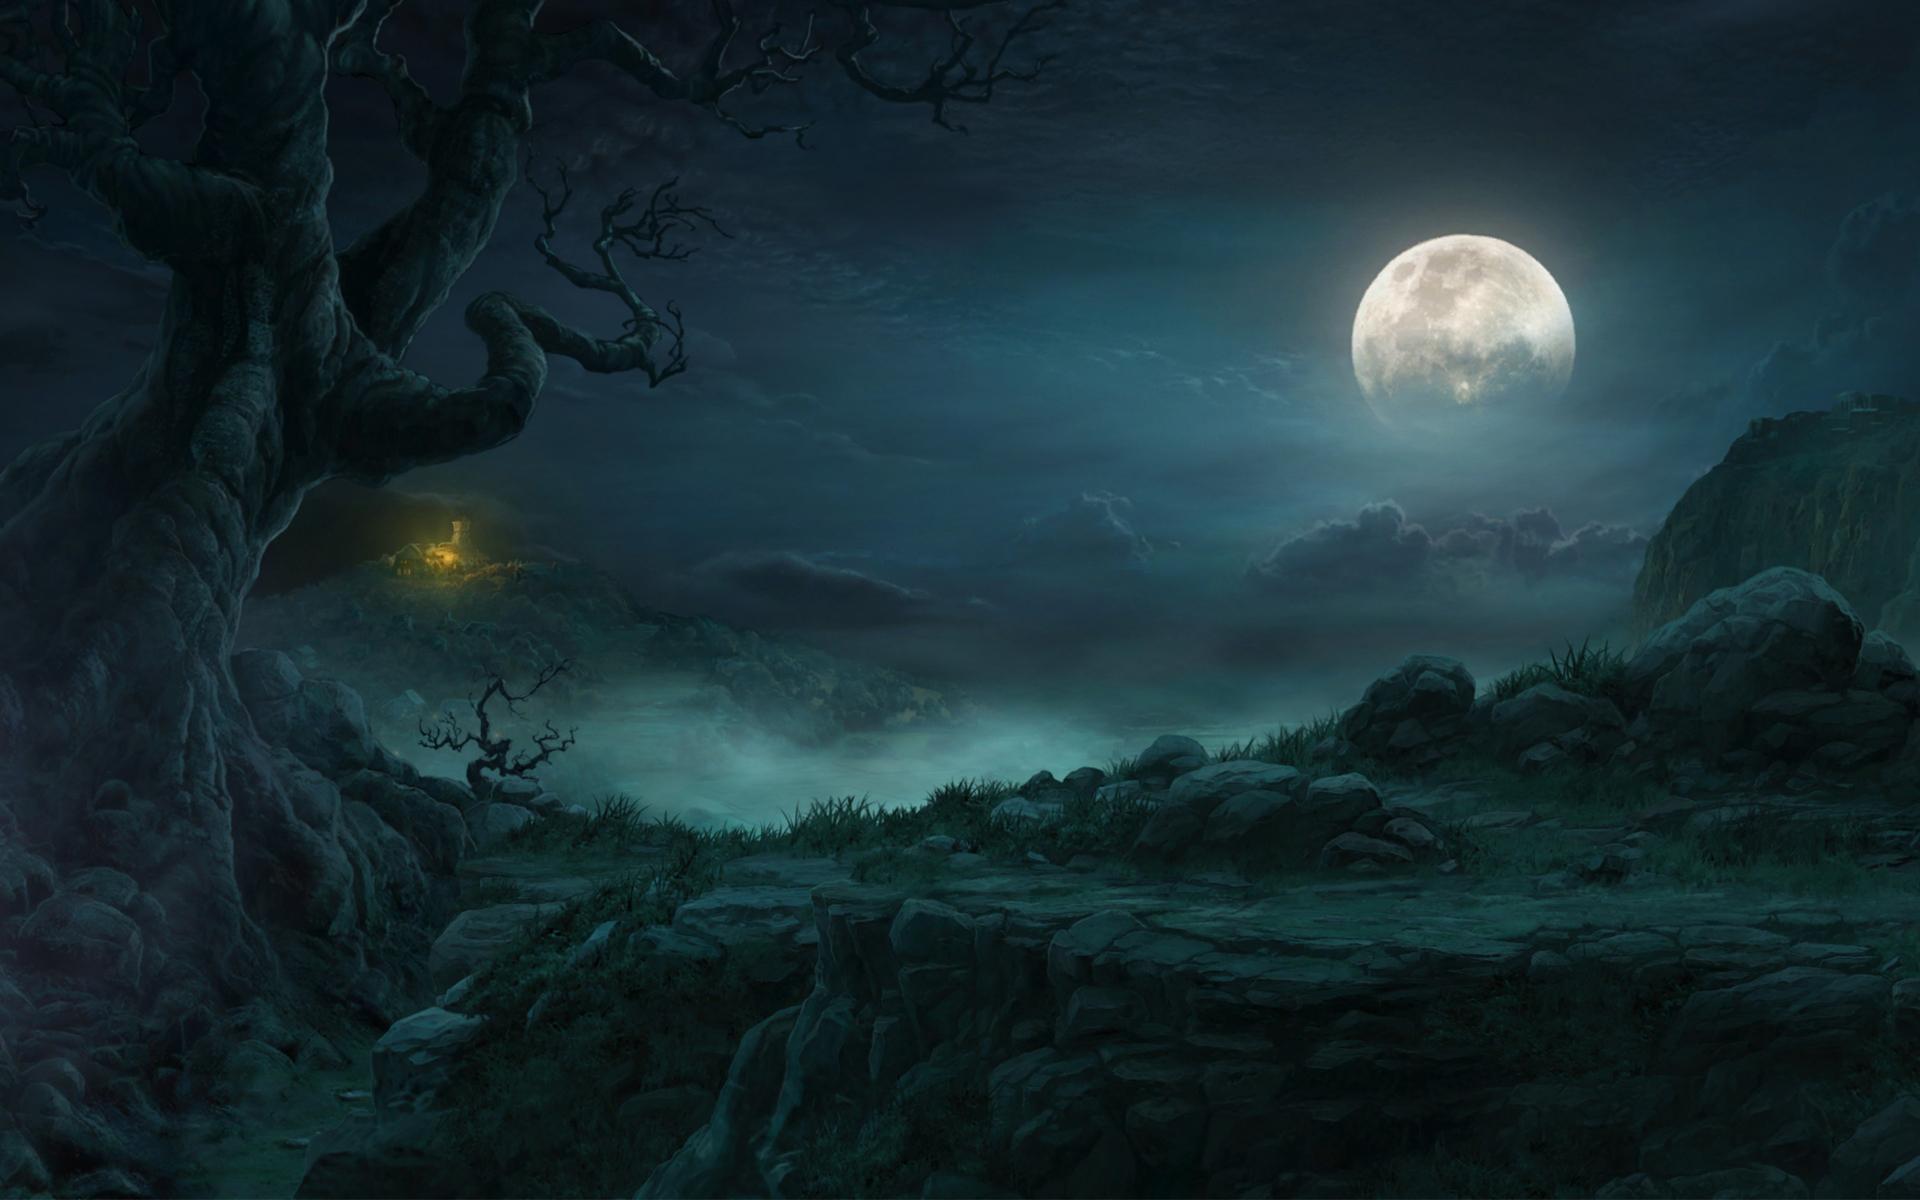 Moon Night Wallpaper Background Picture 1920x1200 pixel Windows HD 1920x1200